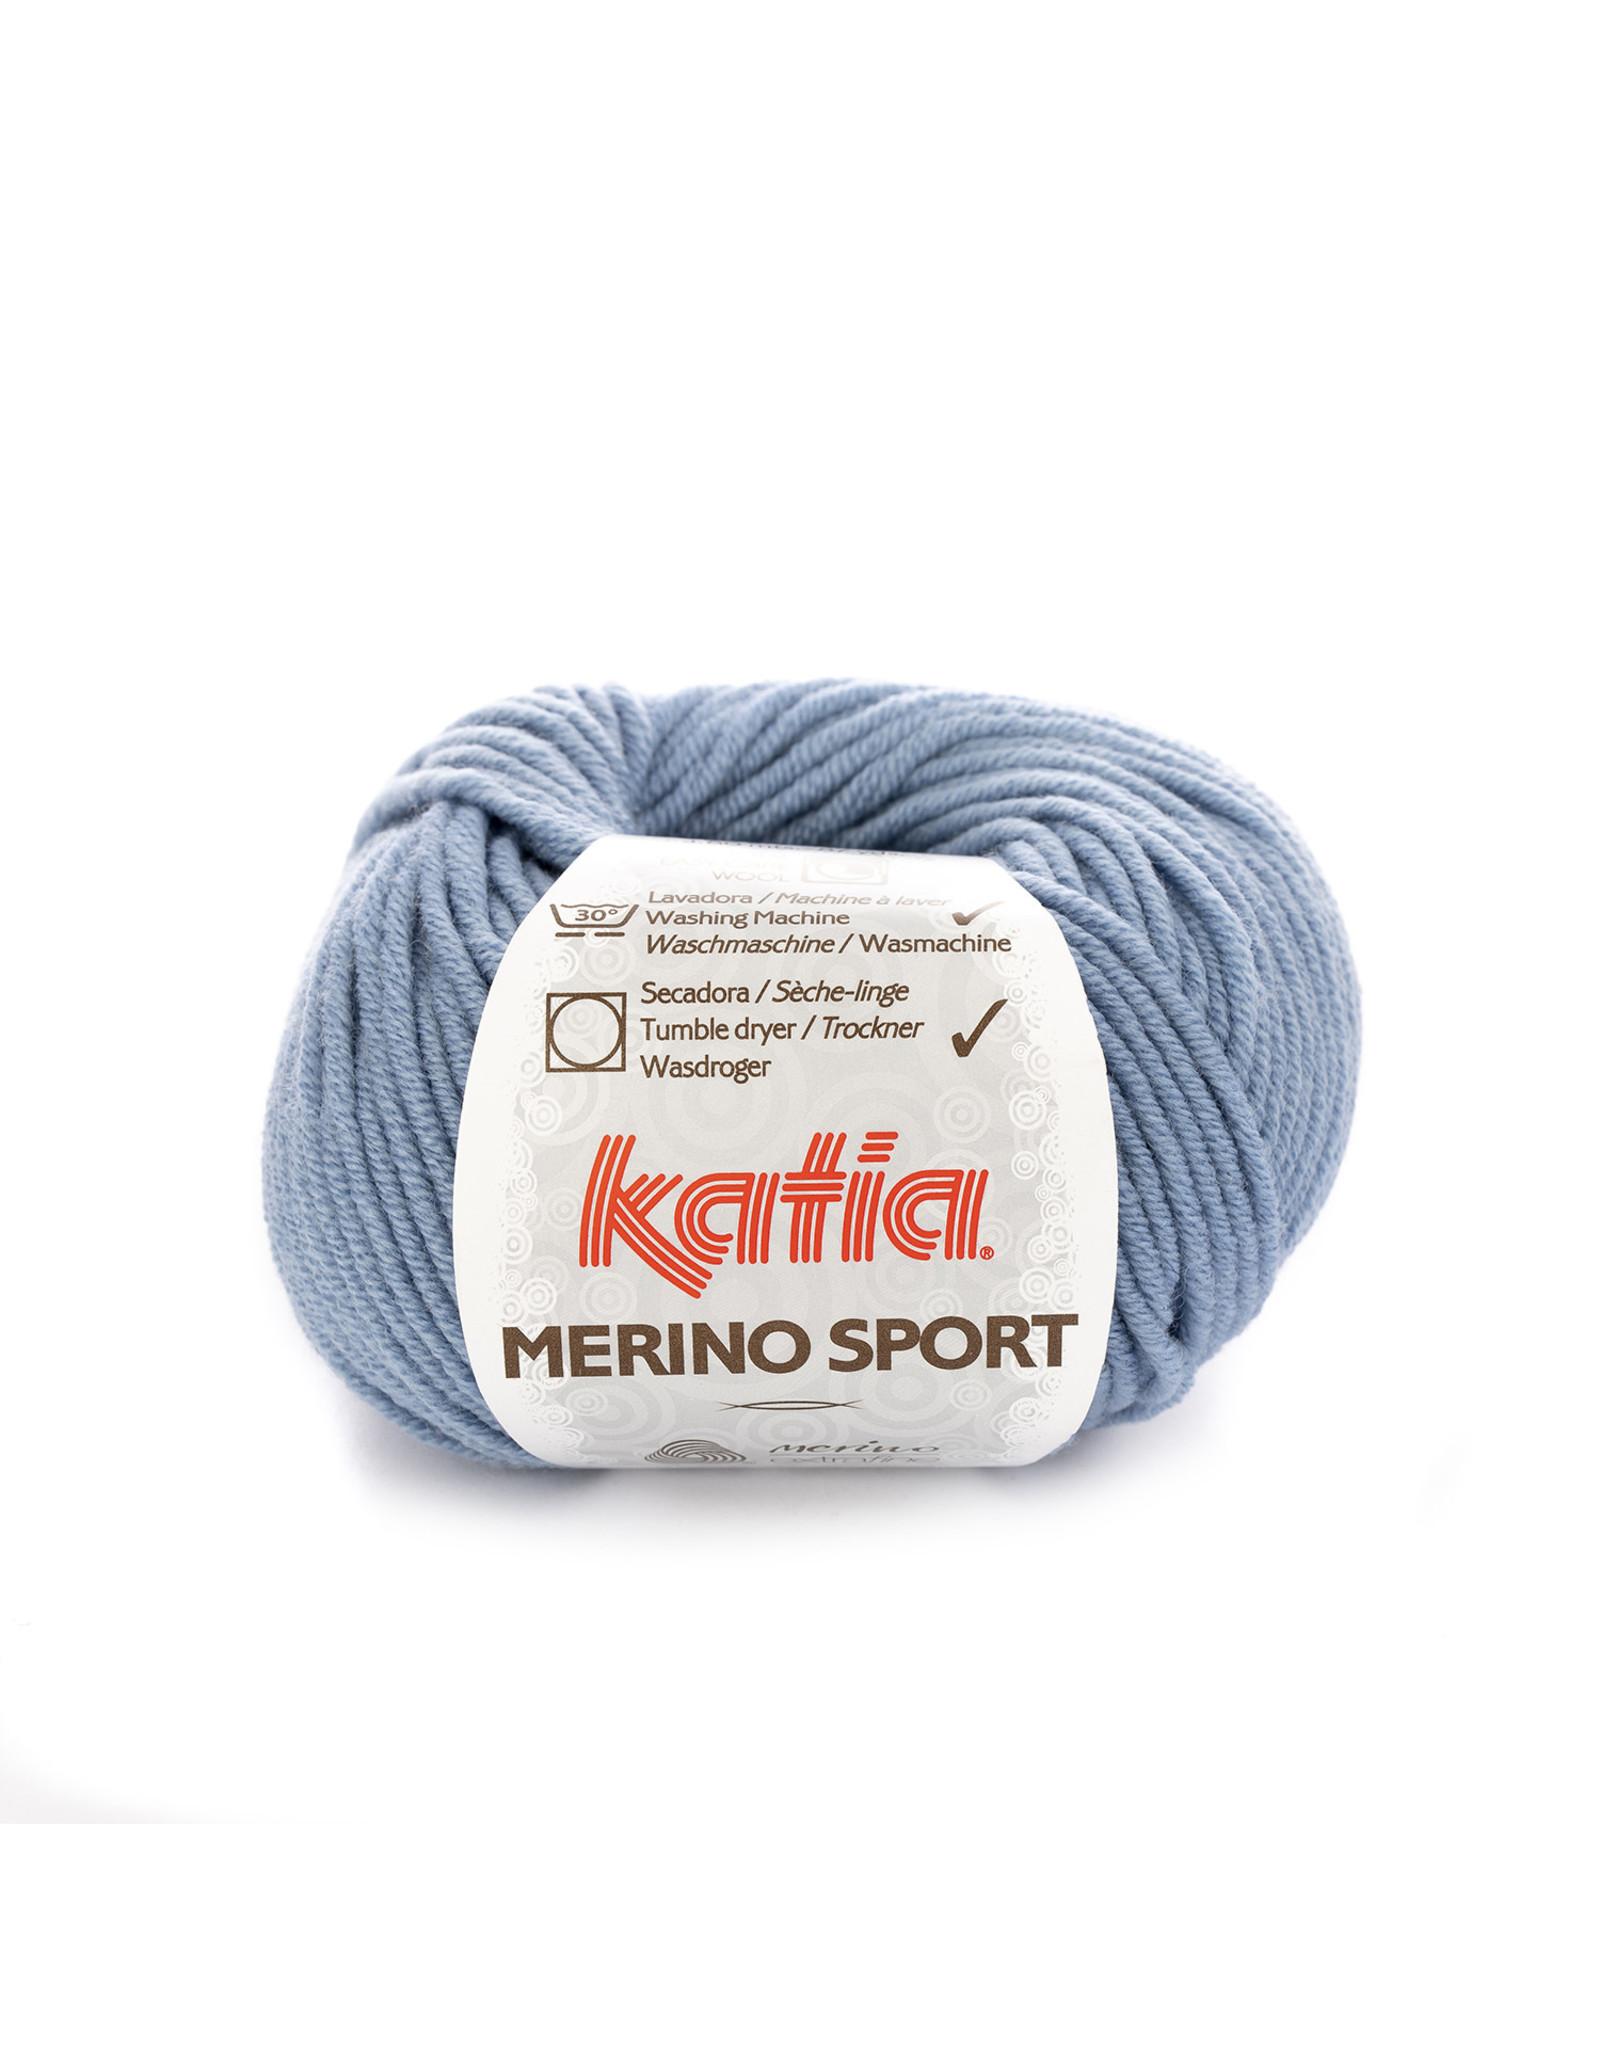 Katia Katia - Merino Sport - 48 Blauw - 50 gr.